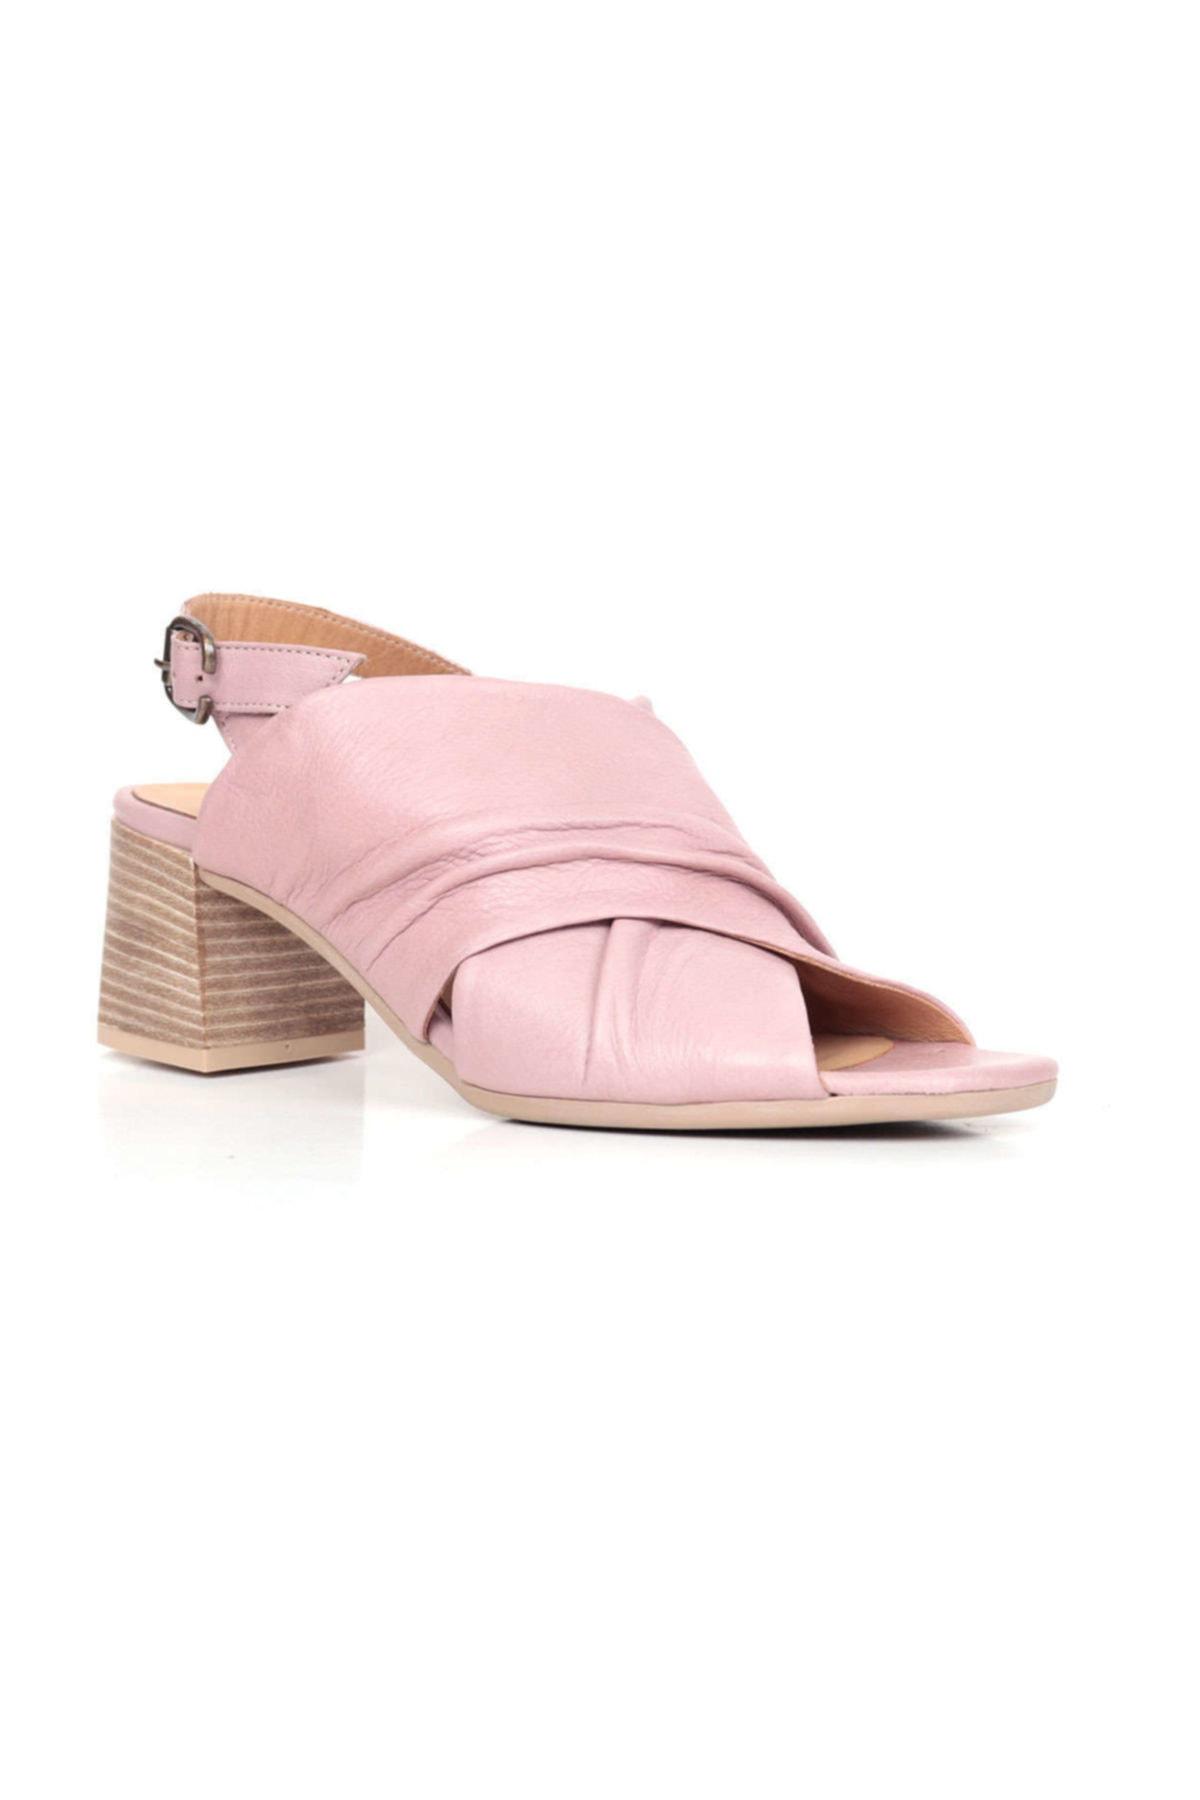 BUENO Shoes Siyah Bayan Sandalet 9n1309 1